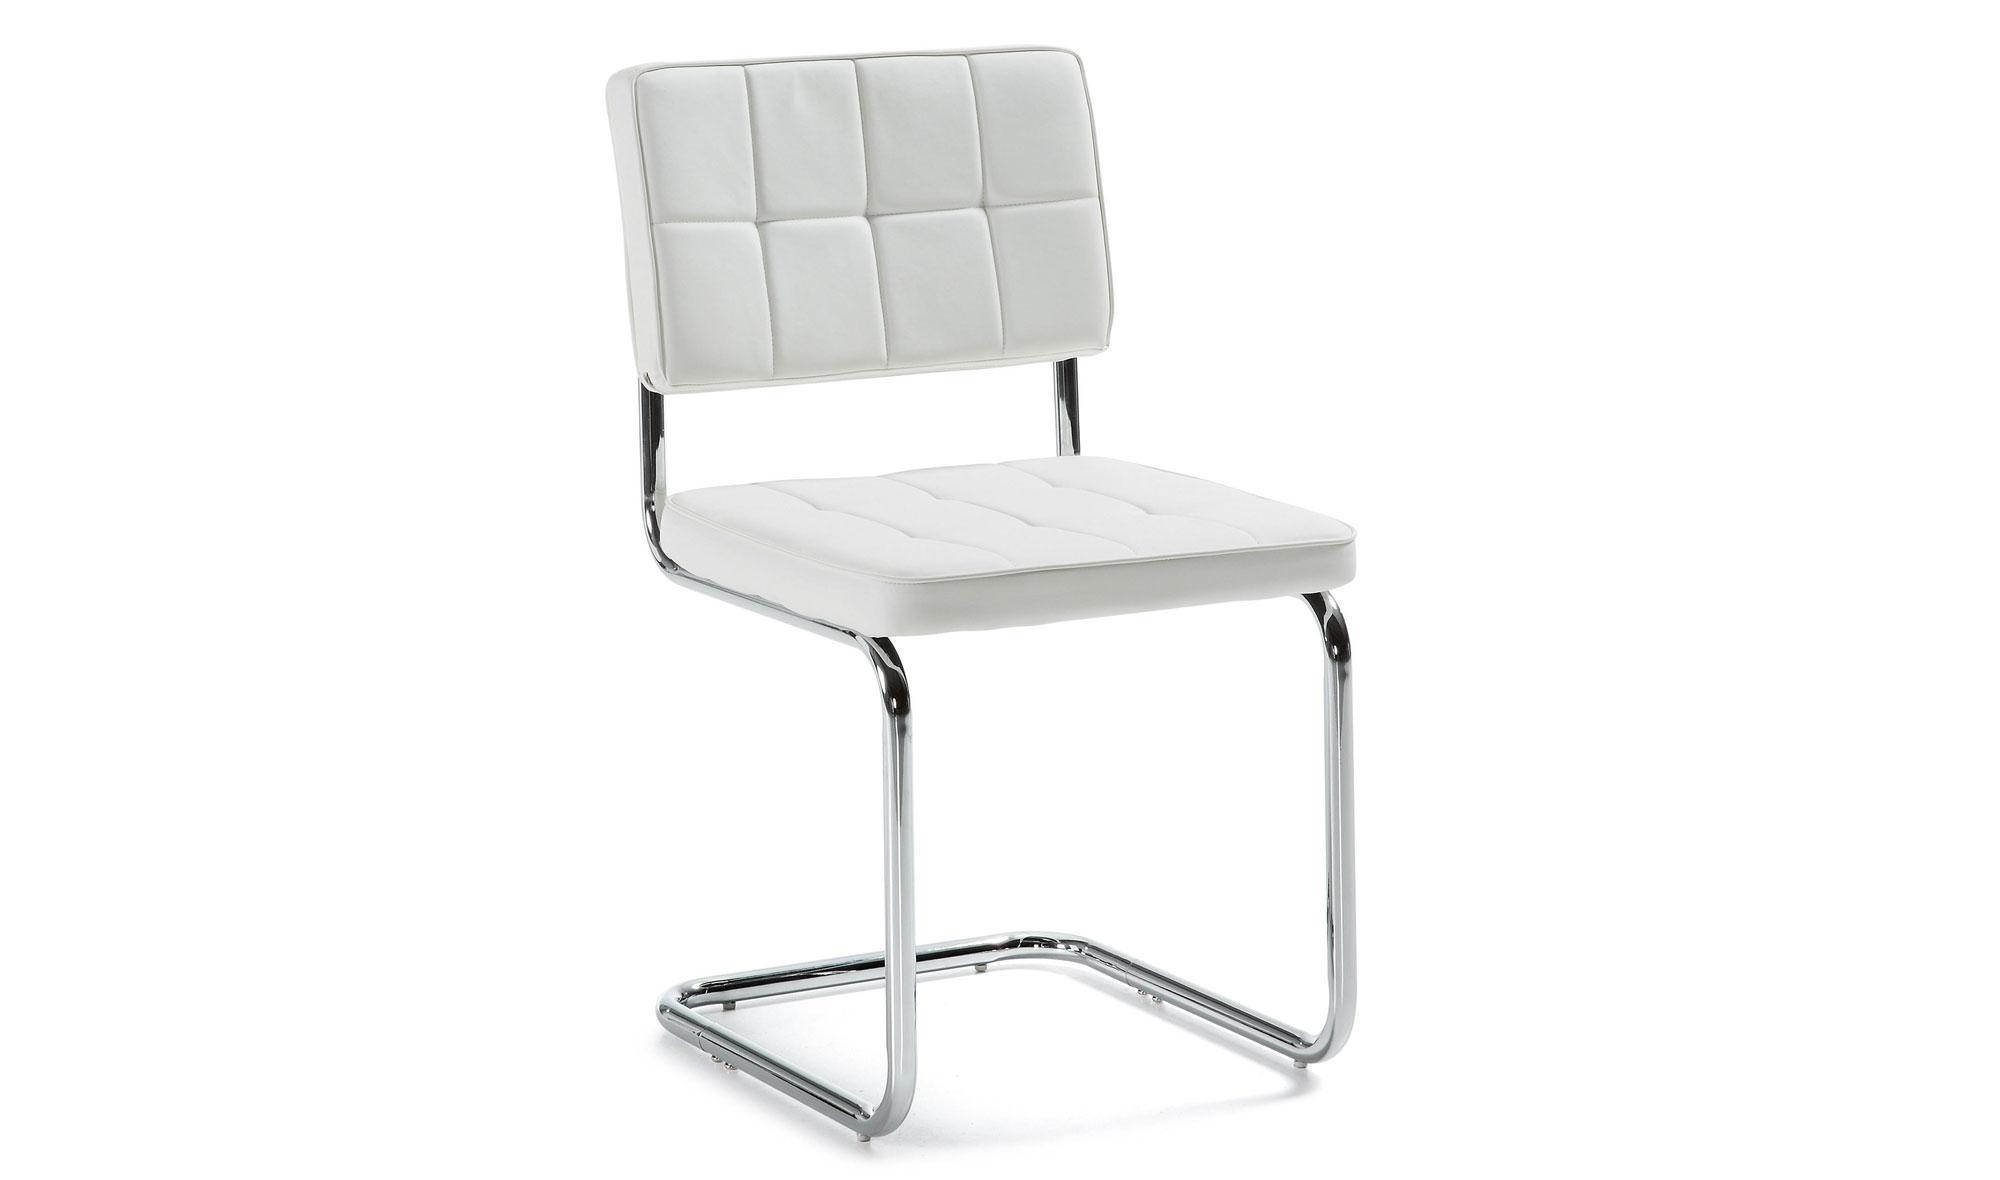 Sillas comedor blancas modernas sillas blancas de comedor for Sillas polipiel baratas